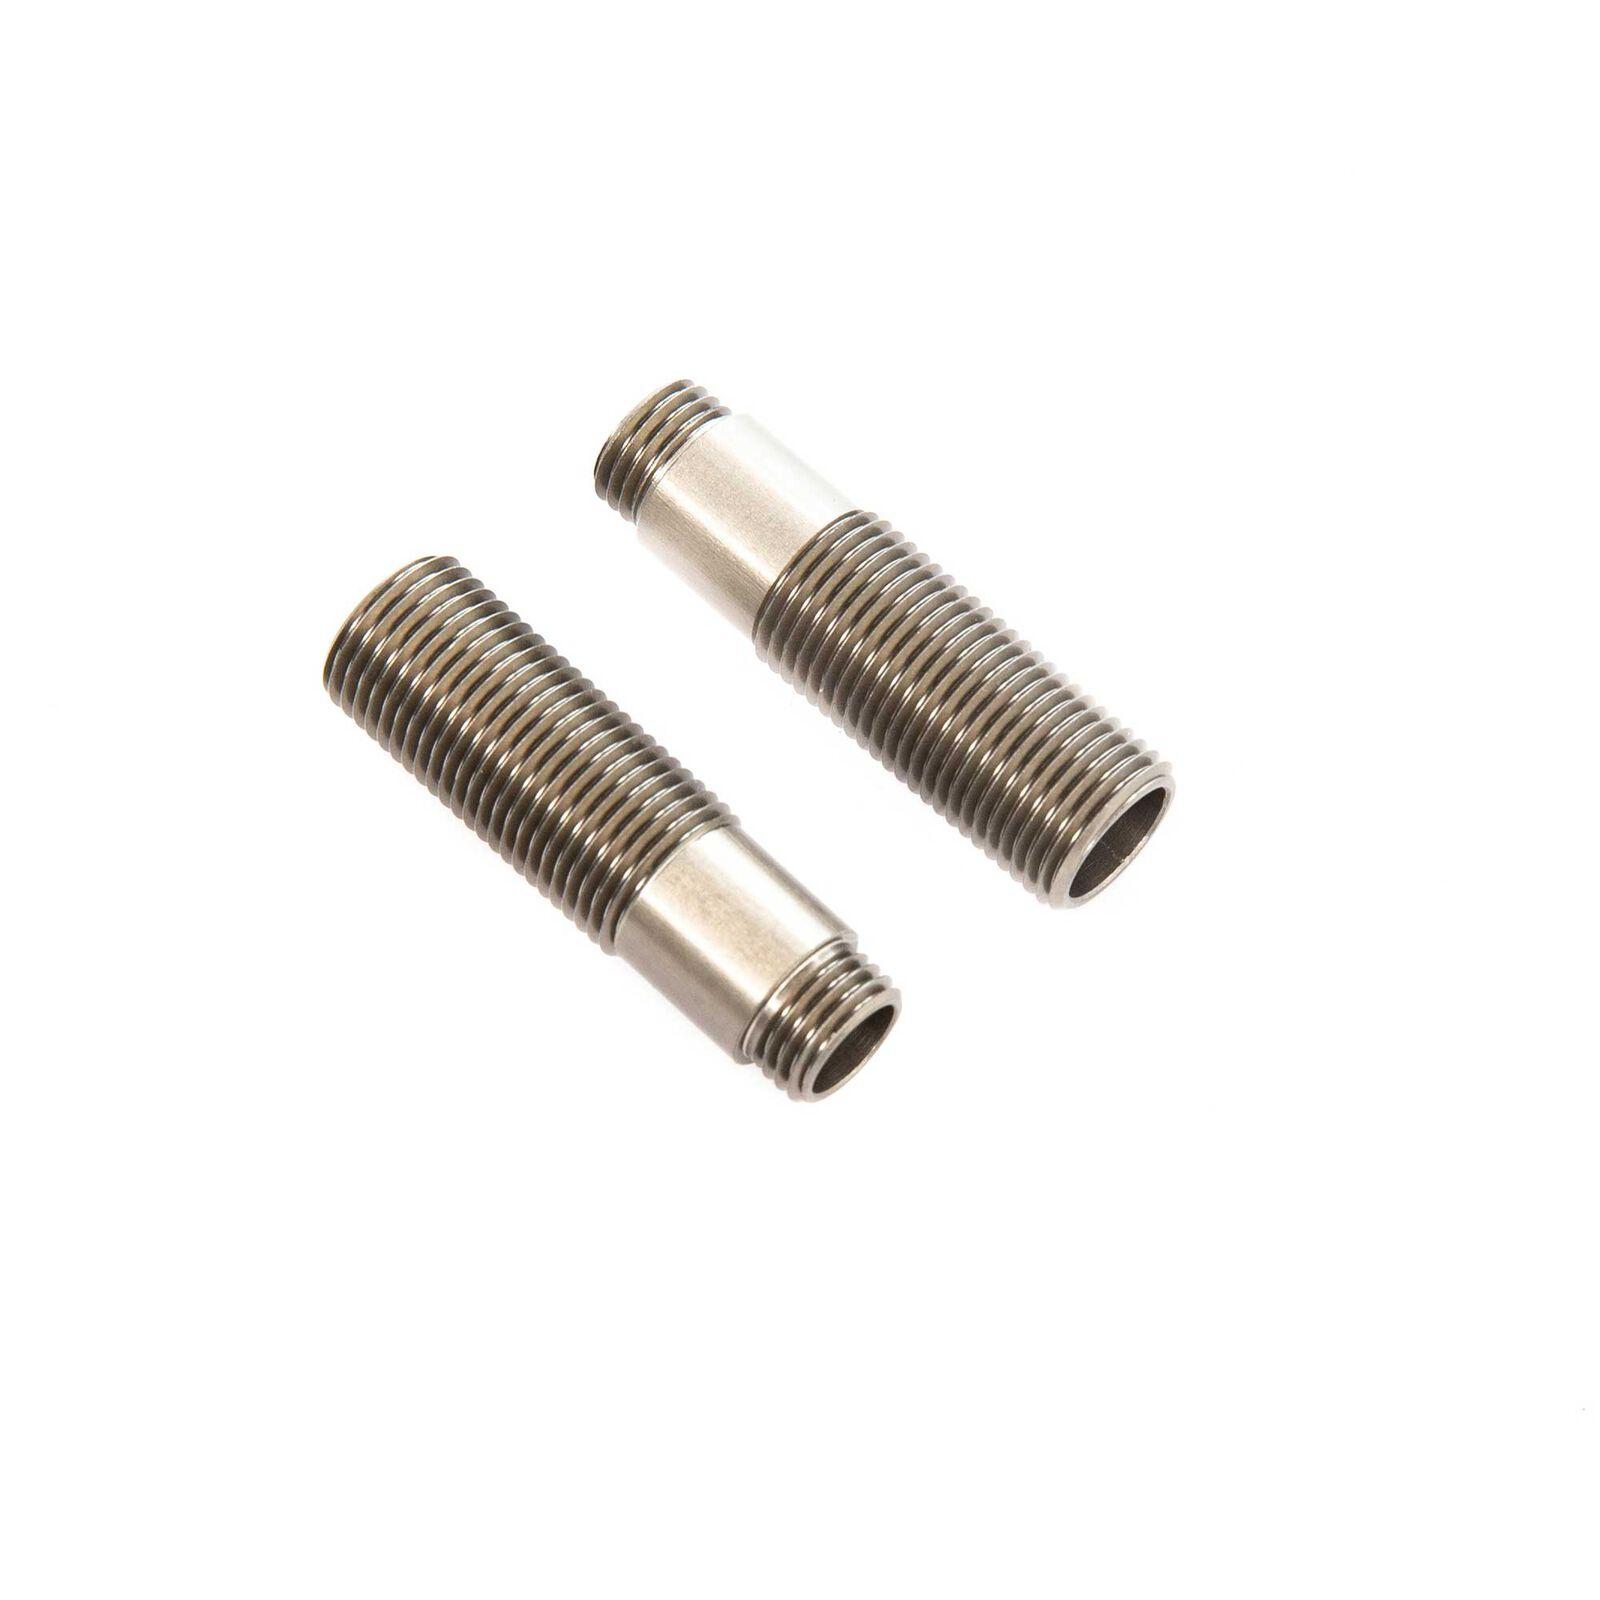 Threaded Shock Body Alum HA, 11x38mm (2): SCX10 III